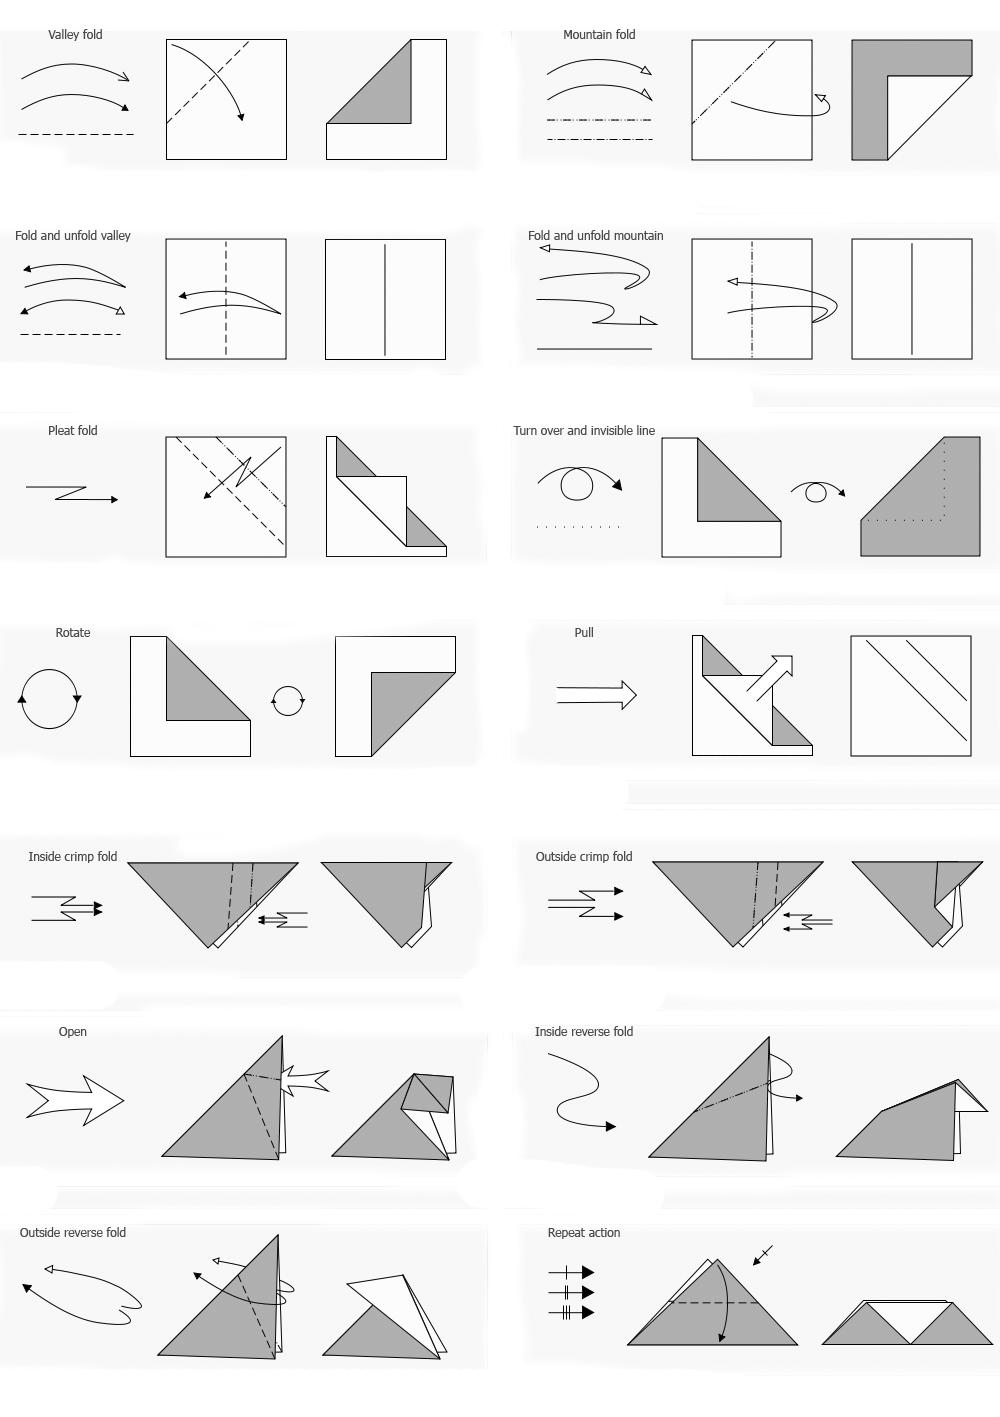 kusudama me modular origami  : modular origami diagrams - findchart.co